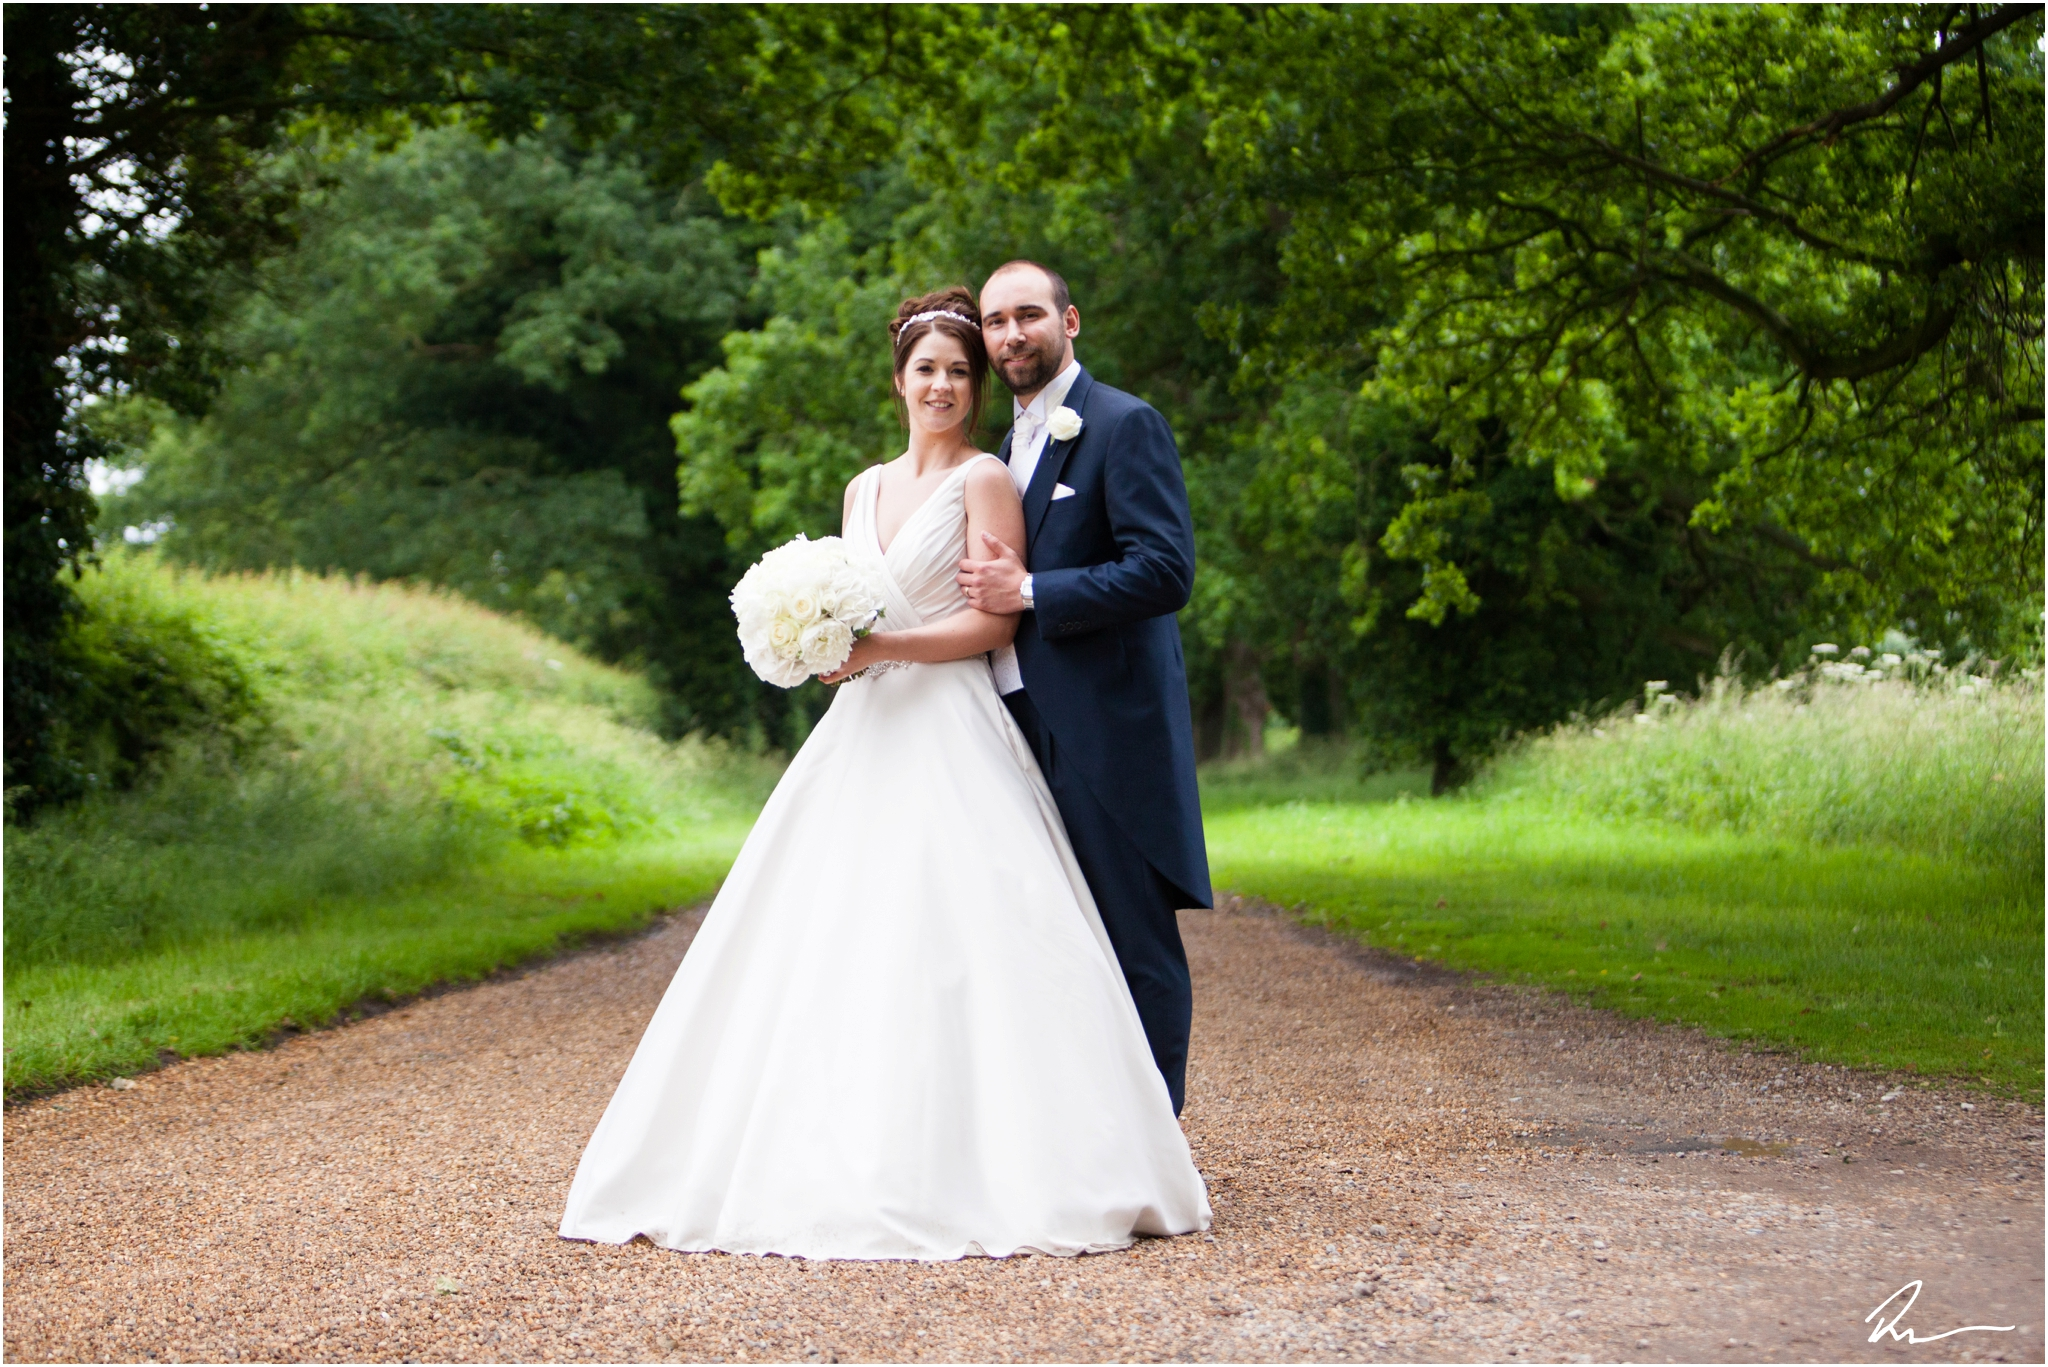 Woodhall-Manor-Wedding-Ross-Dean-Photography_0001.jpg